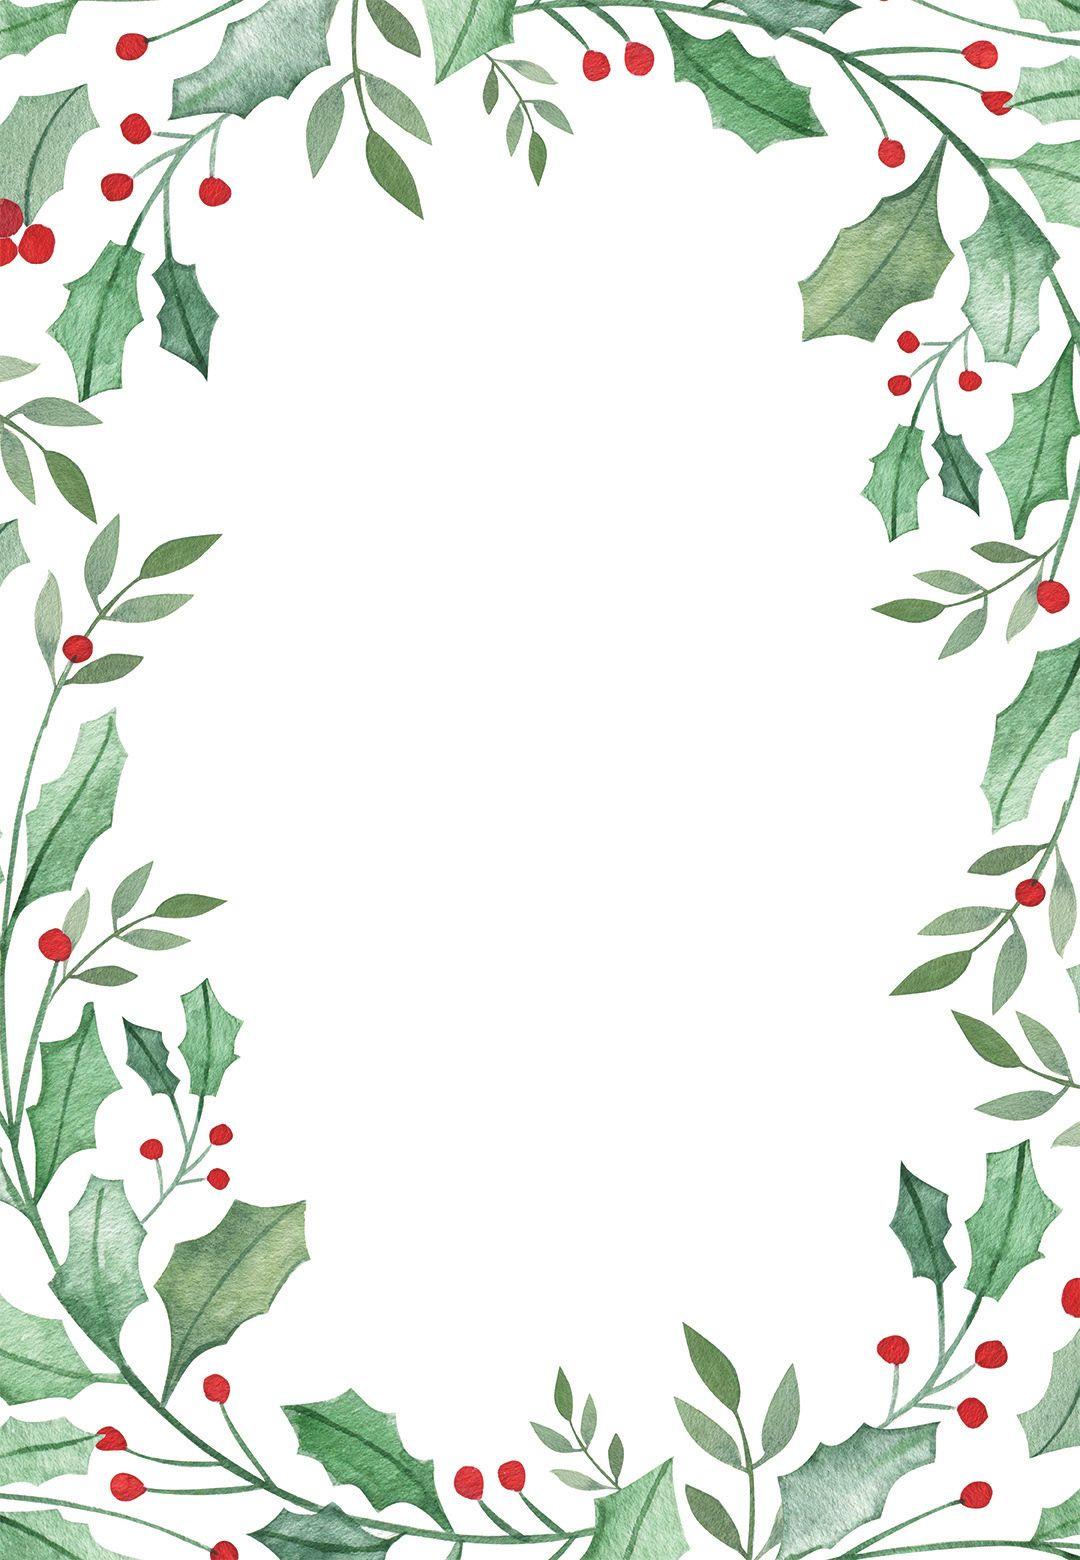 Leaf & Holly Border Free Christmas Invitation Template